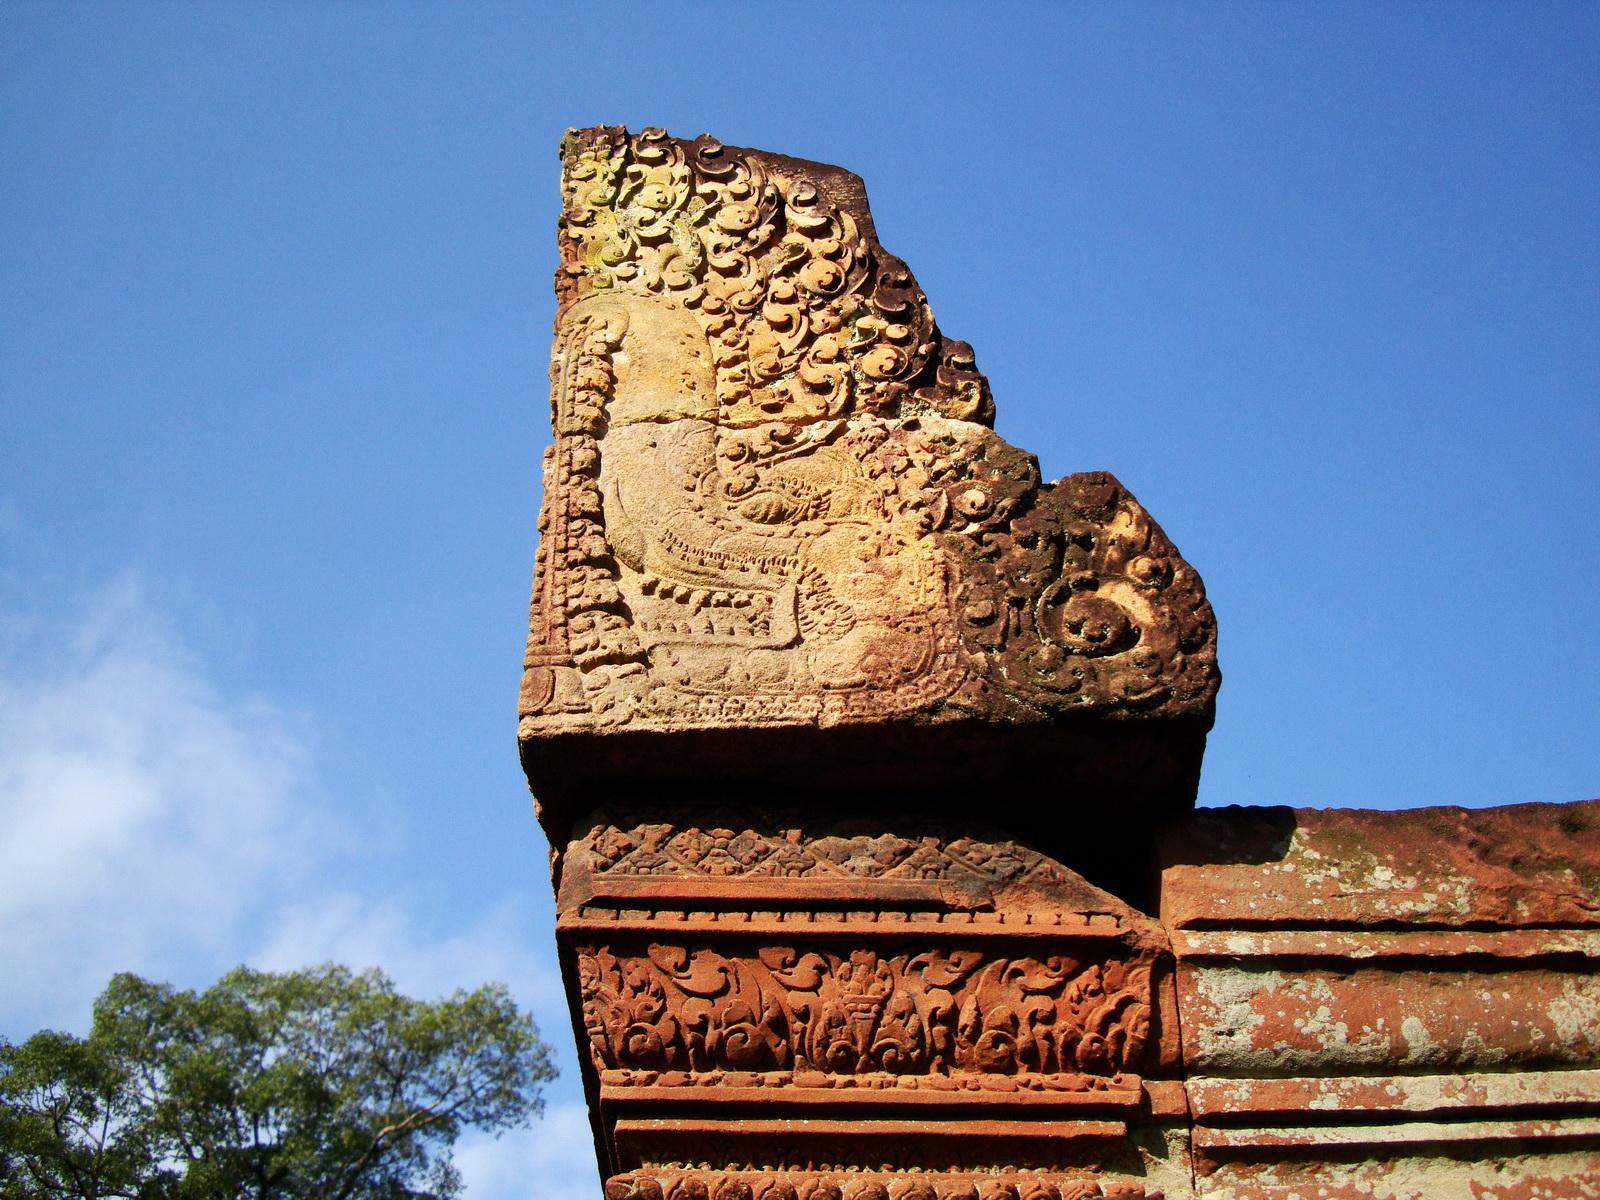 Banteay Srei Hindu Temple red sandstone carved pillars 11